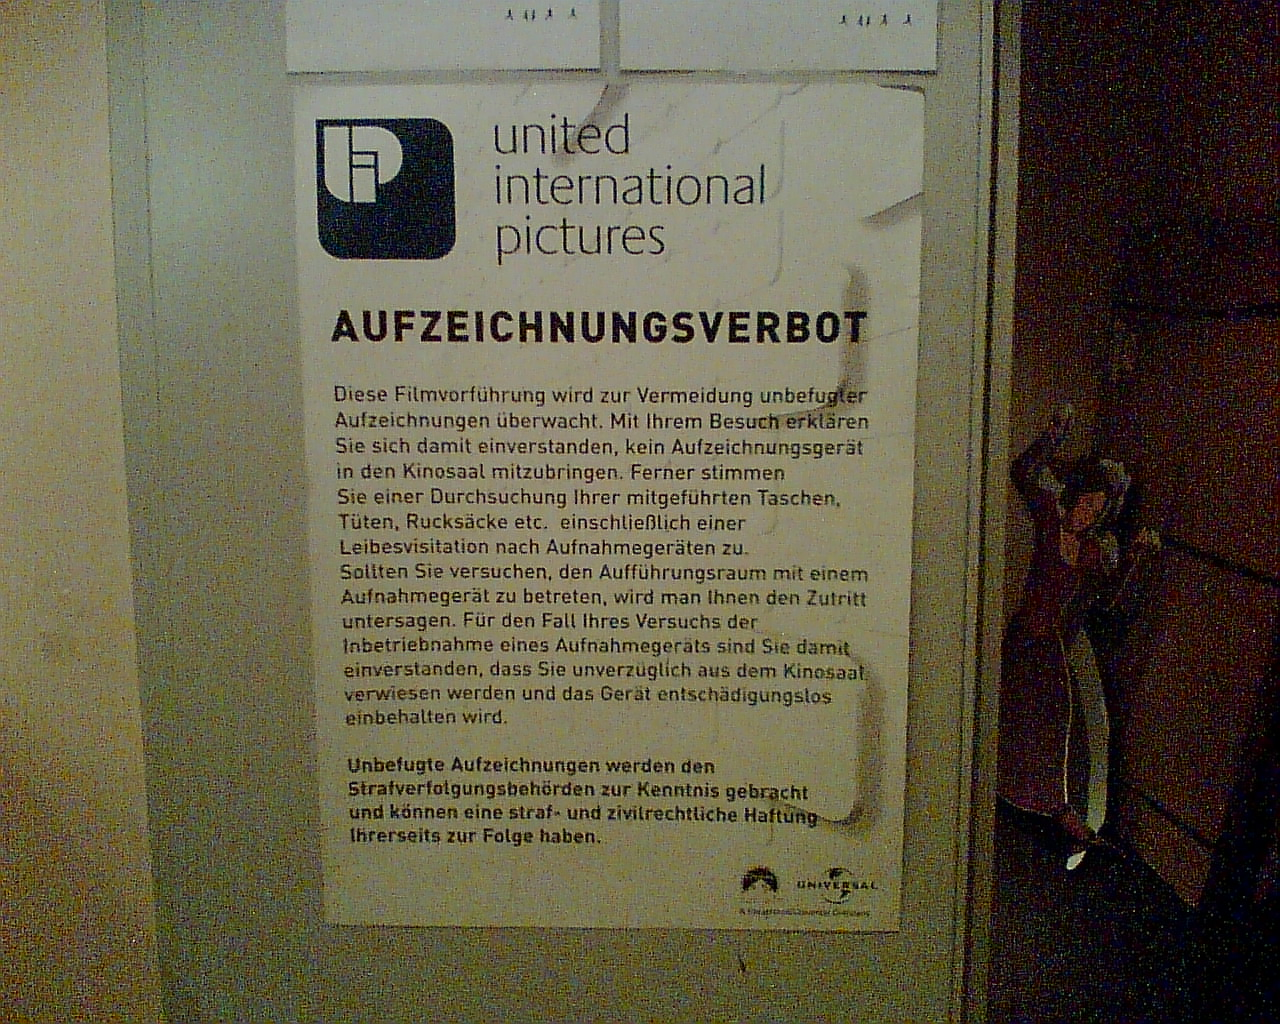 Uncomfortable Announcement at Ambo Stuttgart